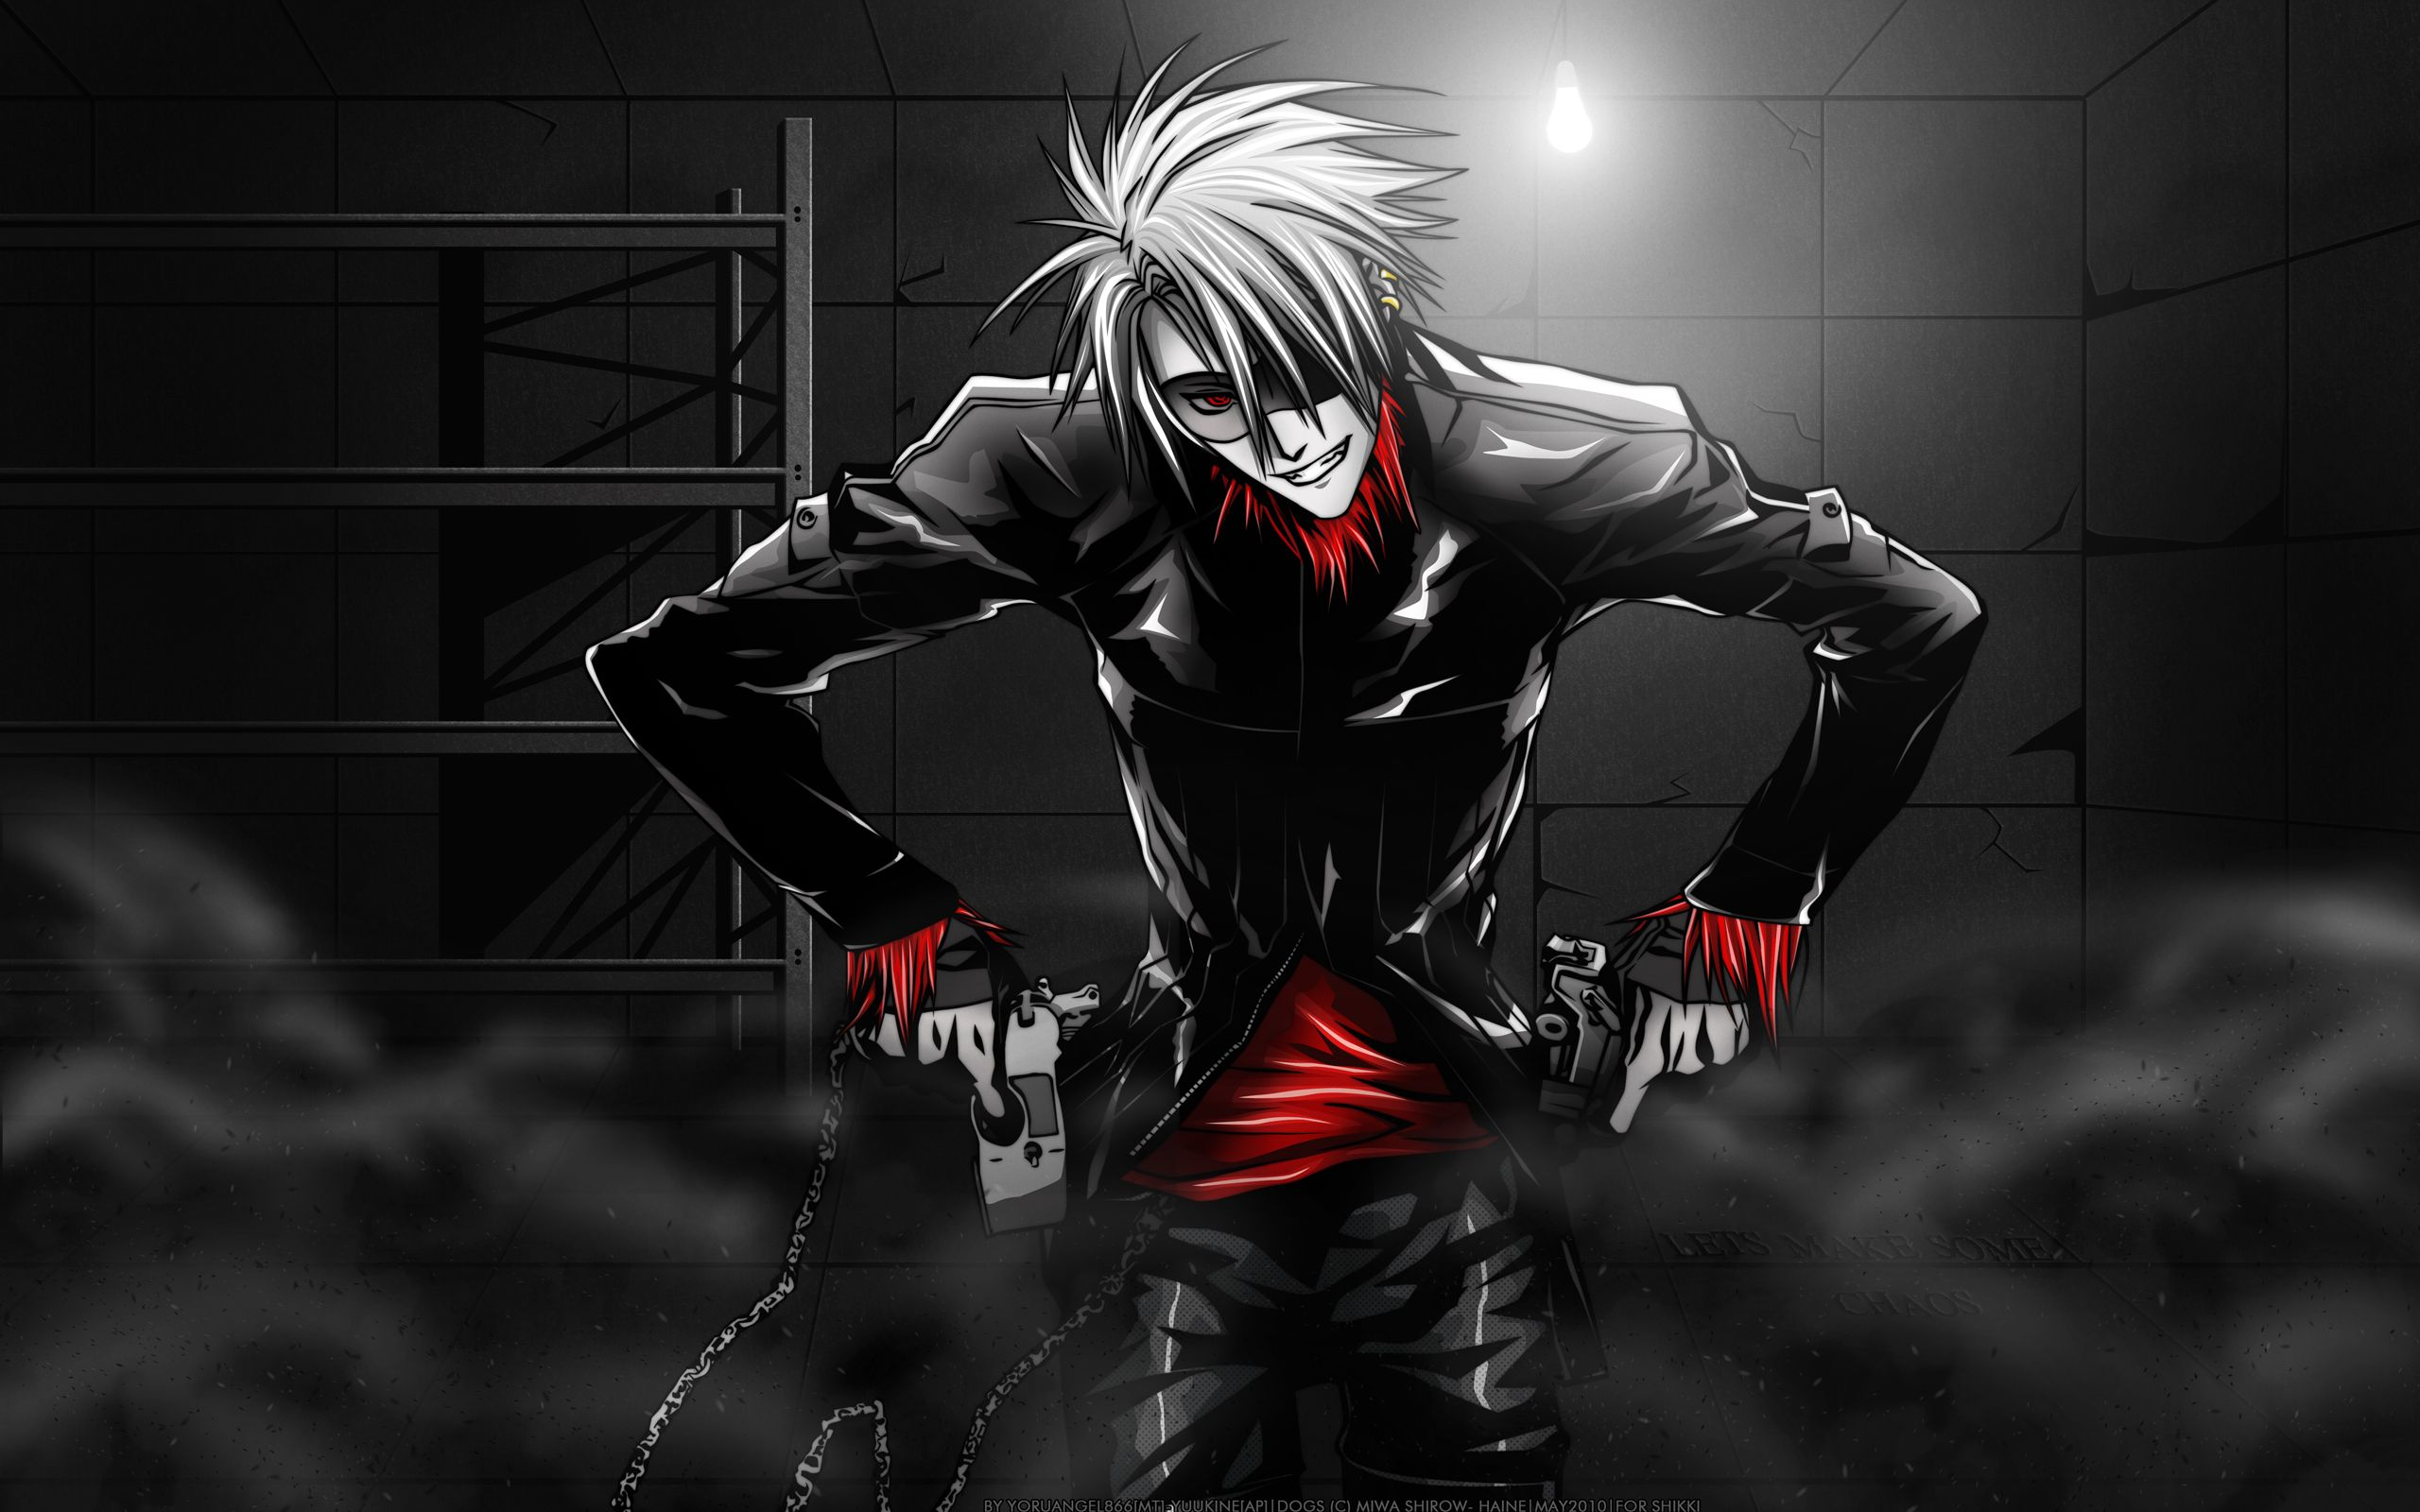 Black And Red Fan Art And Art Black Fan Red Anime Demon Boy Anime Guys Shirtless Nightcore